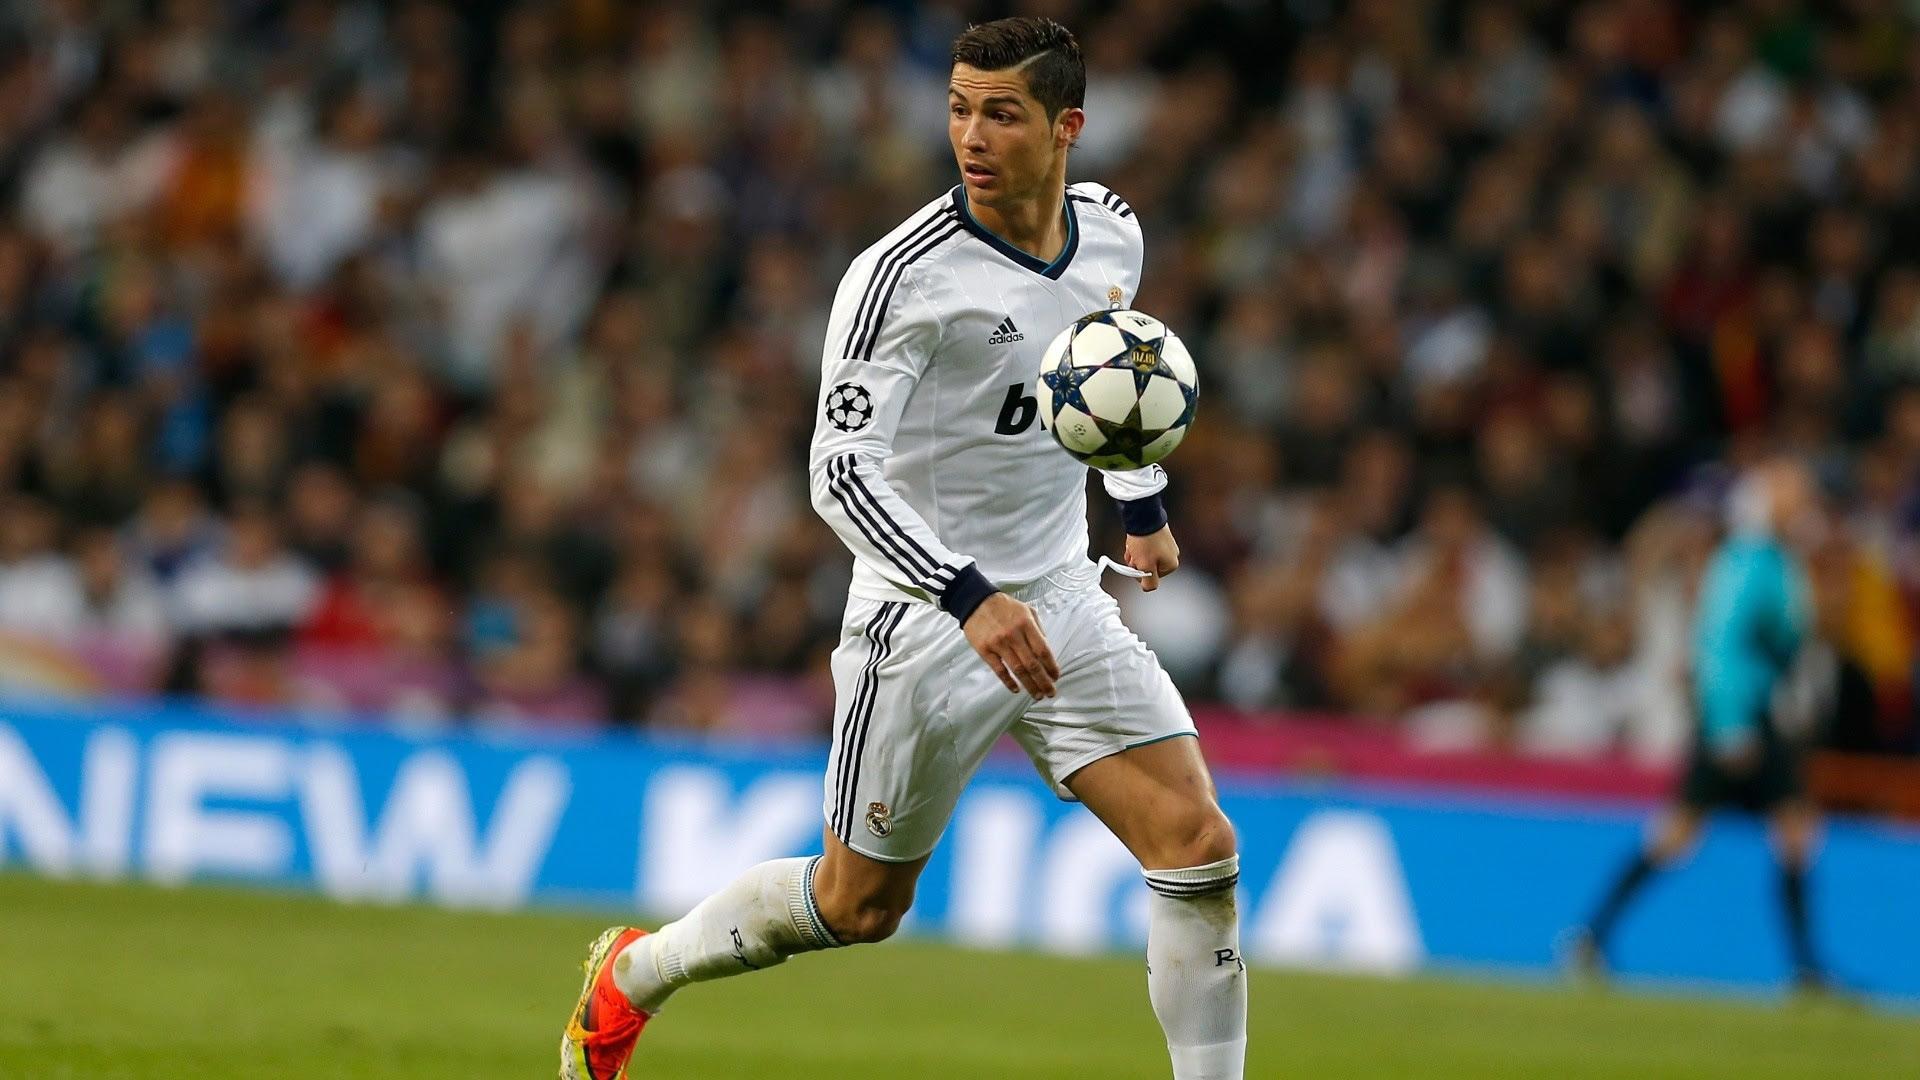 Cristiano Ronaldo Tops SI Men's 50 Most Fit Athletes List